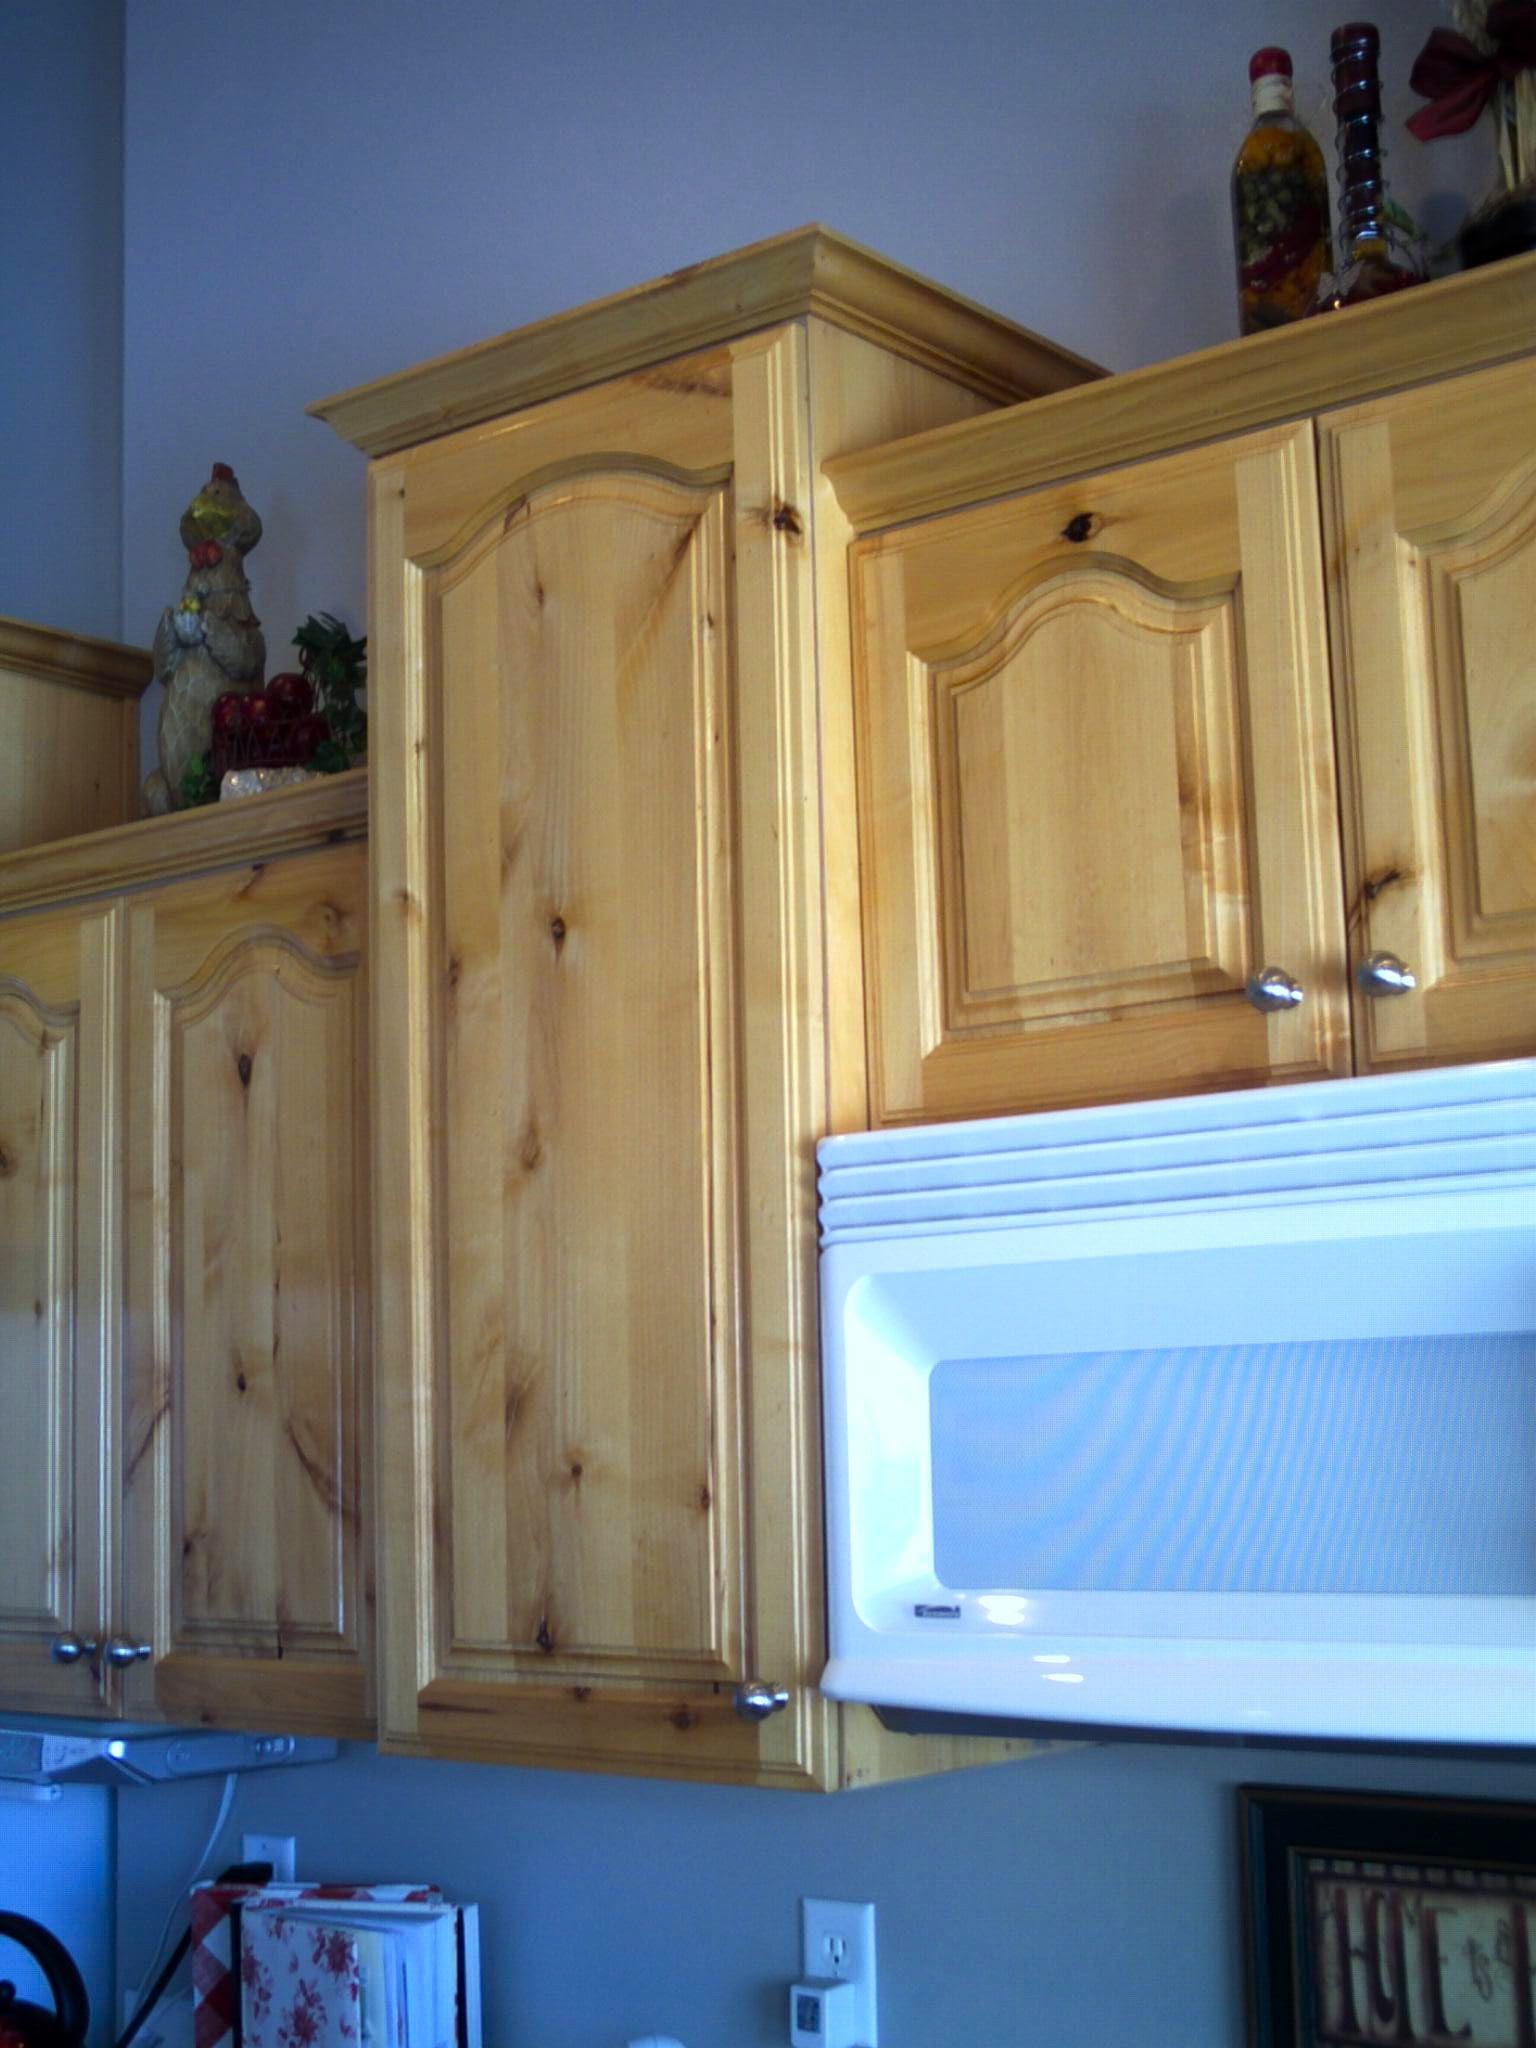 Refinished Knotty Alderwood Cabinets